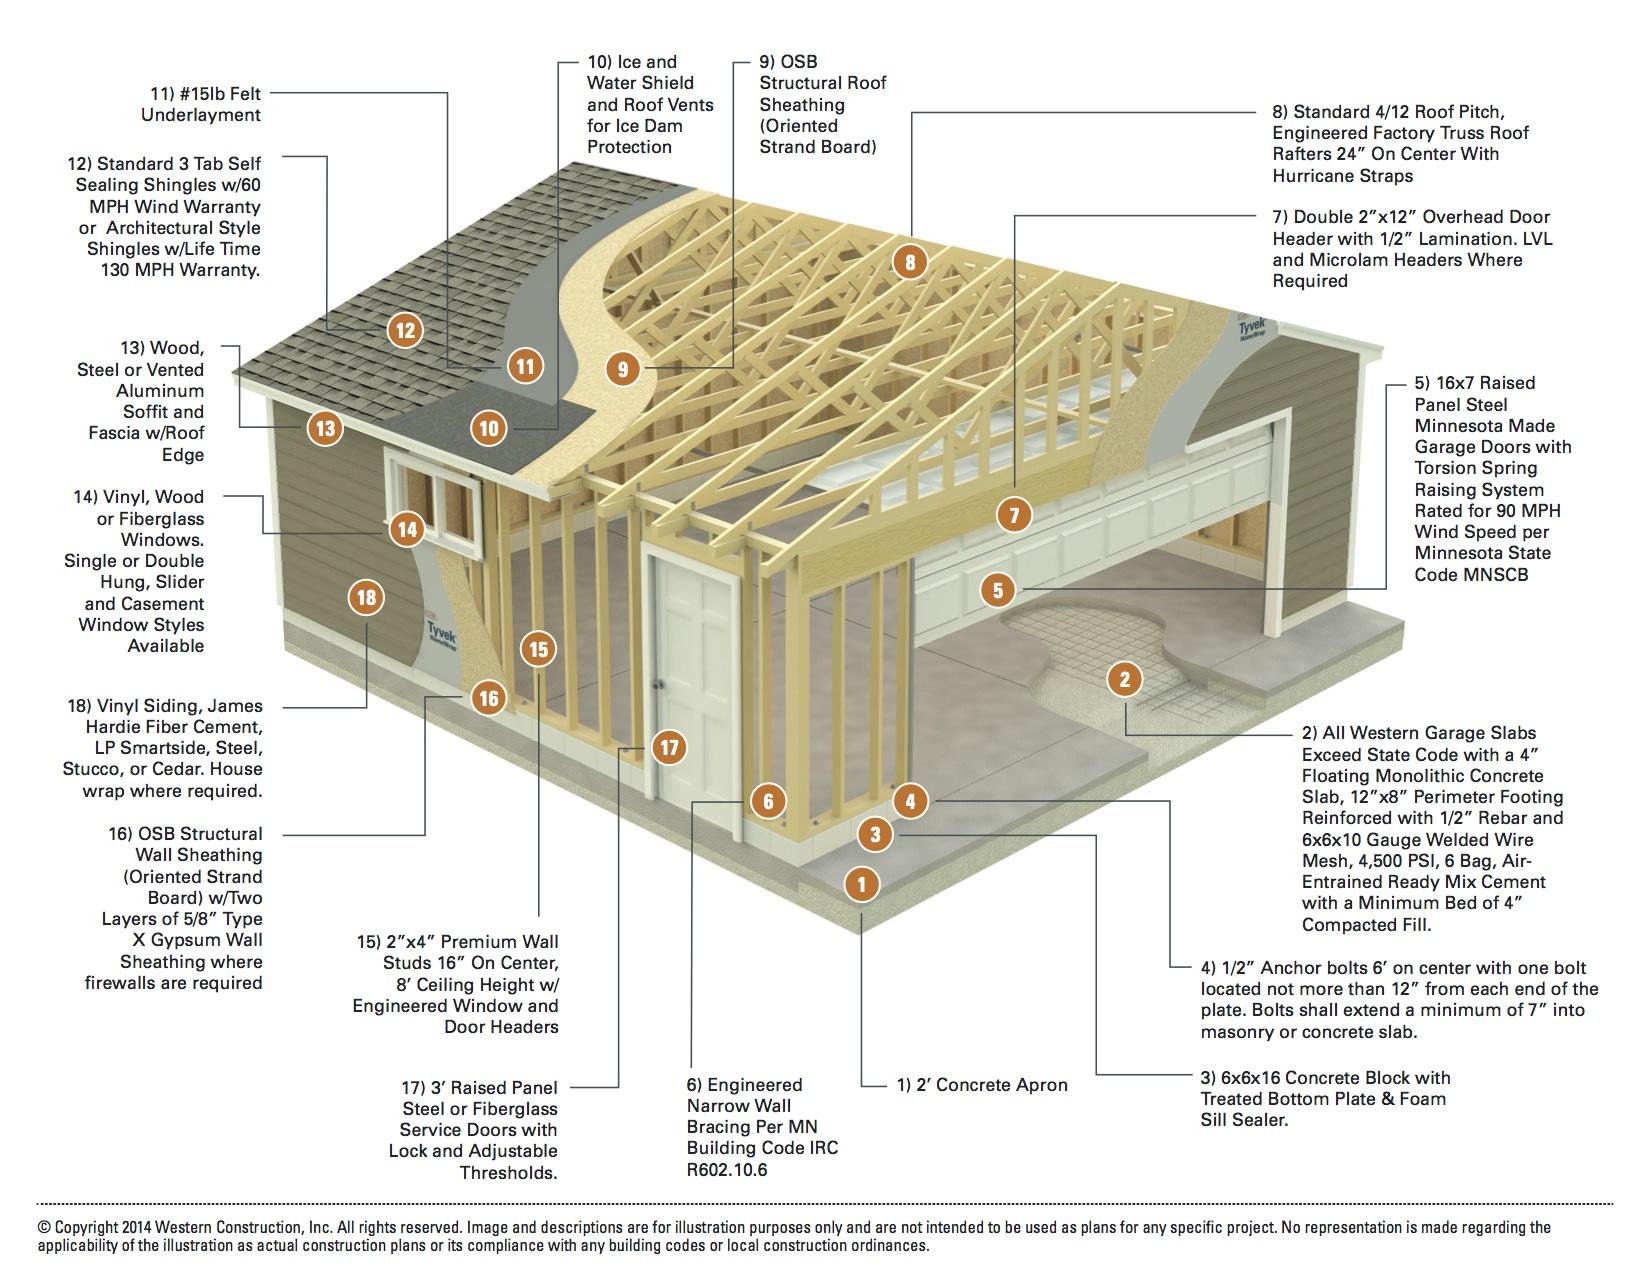 Garage Construction Specifications Plans Minneapolis St Paul